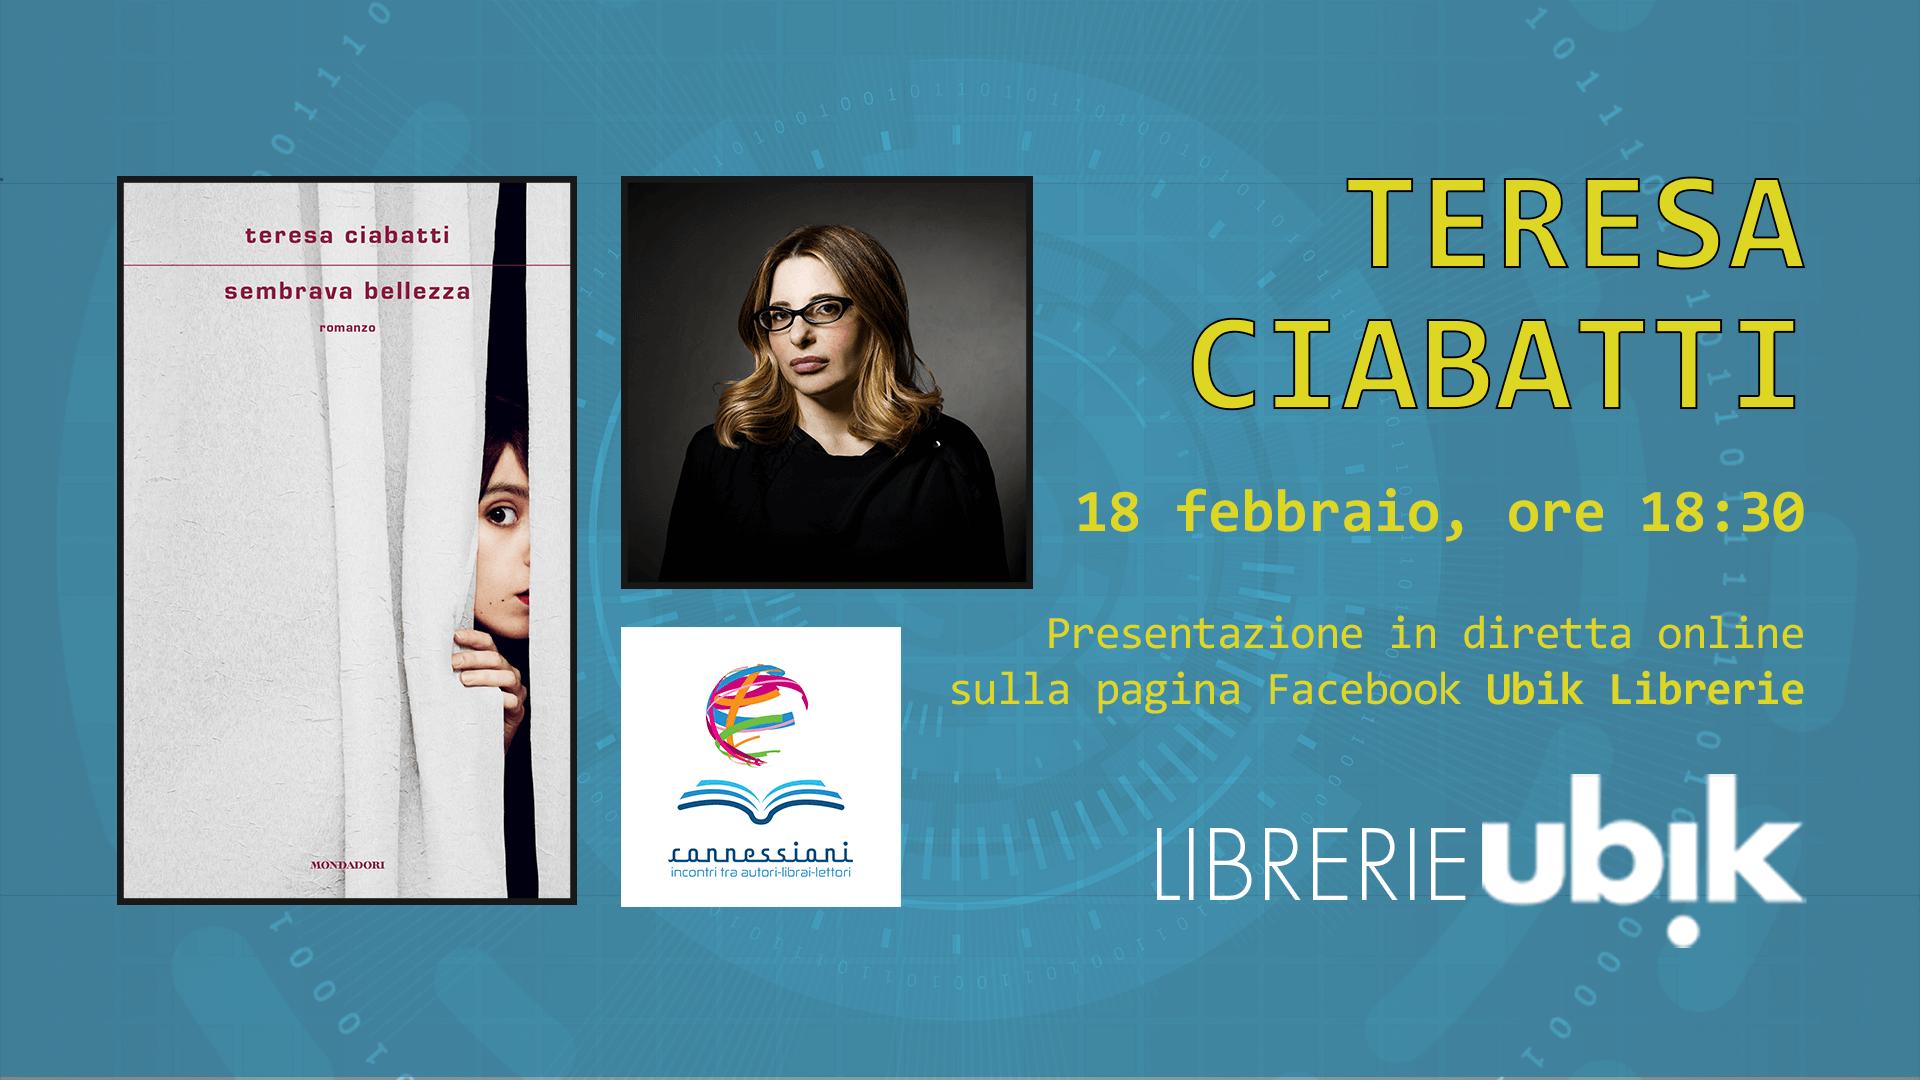 TERESA CIABATTI presenta in diretta online